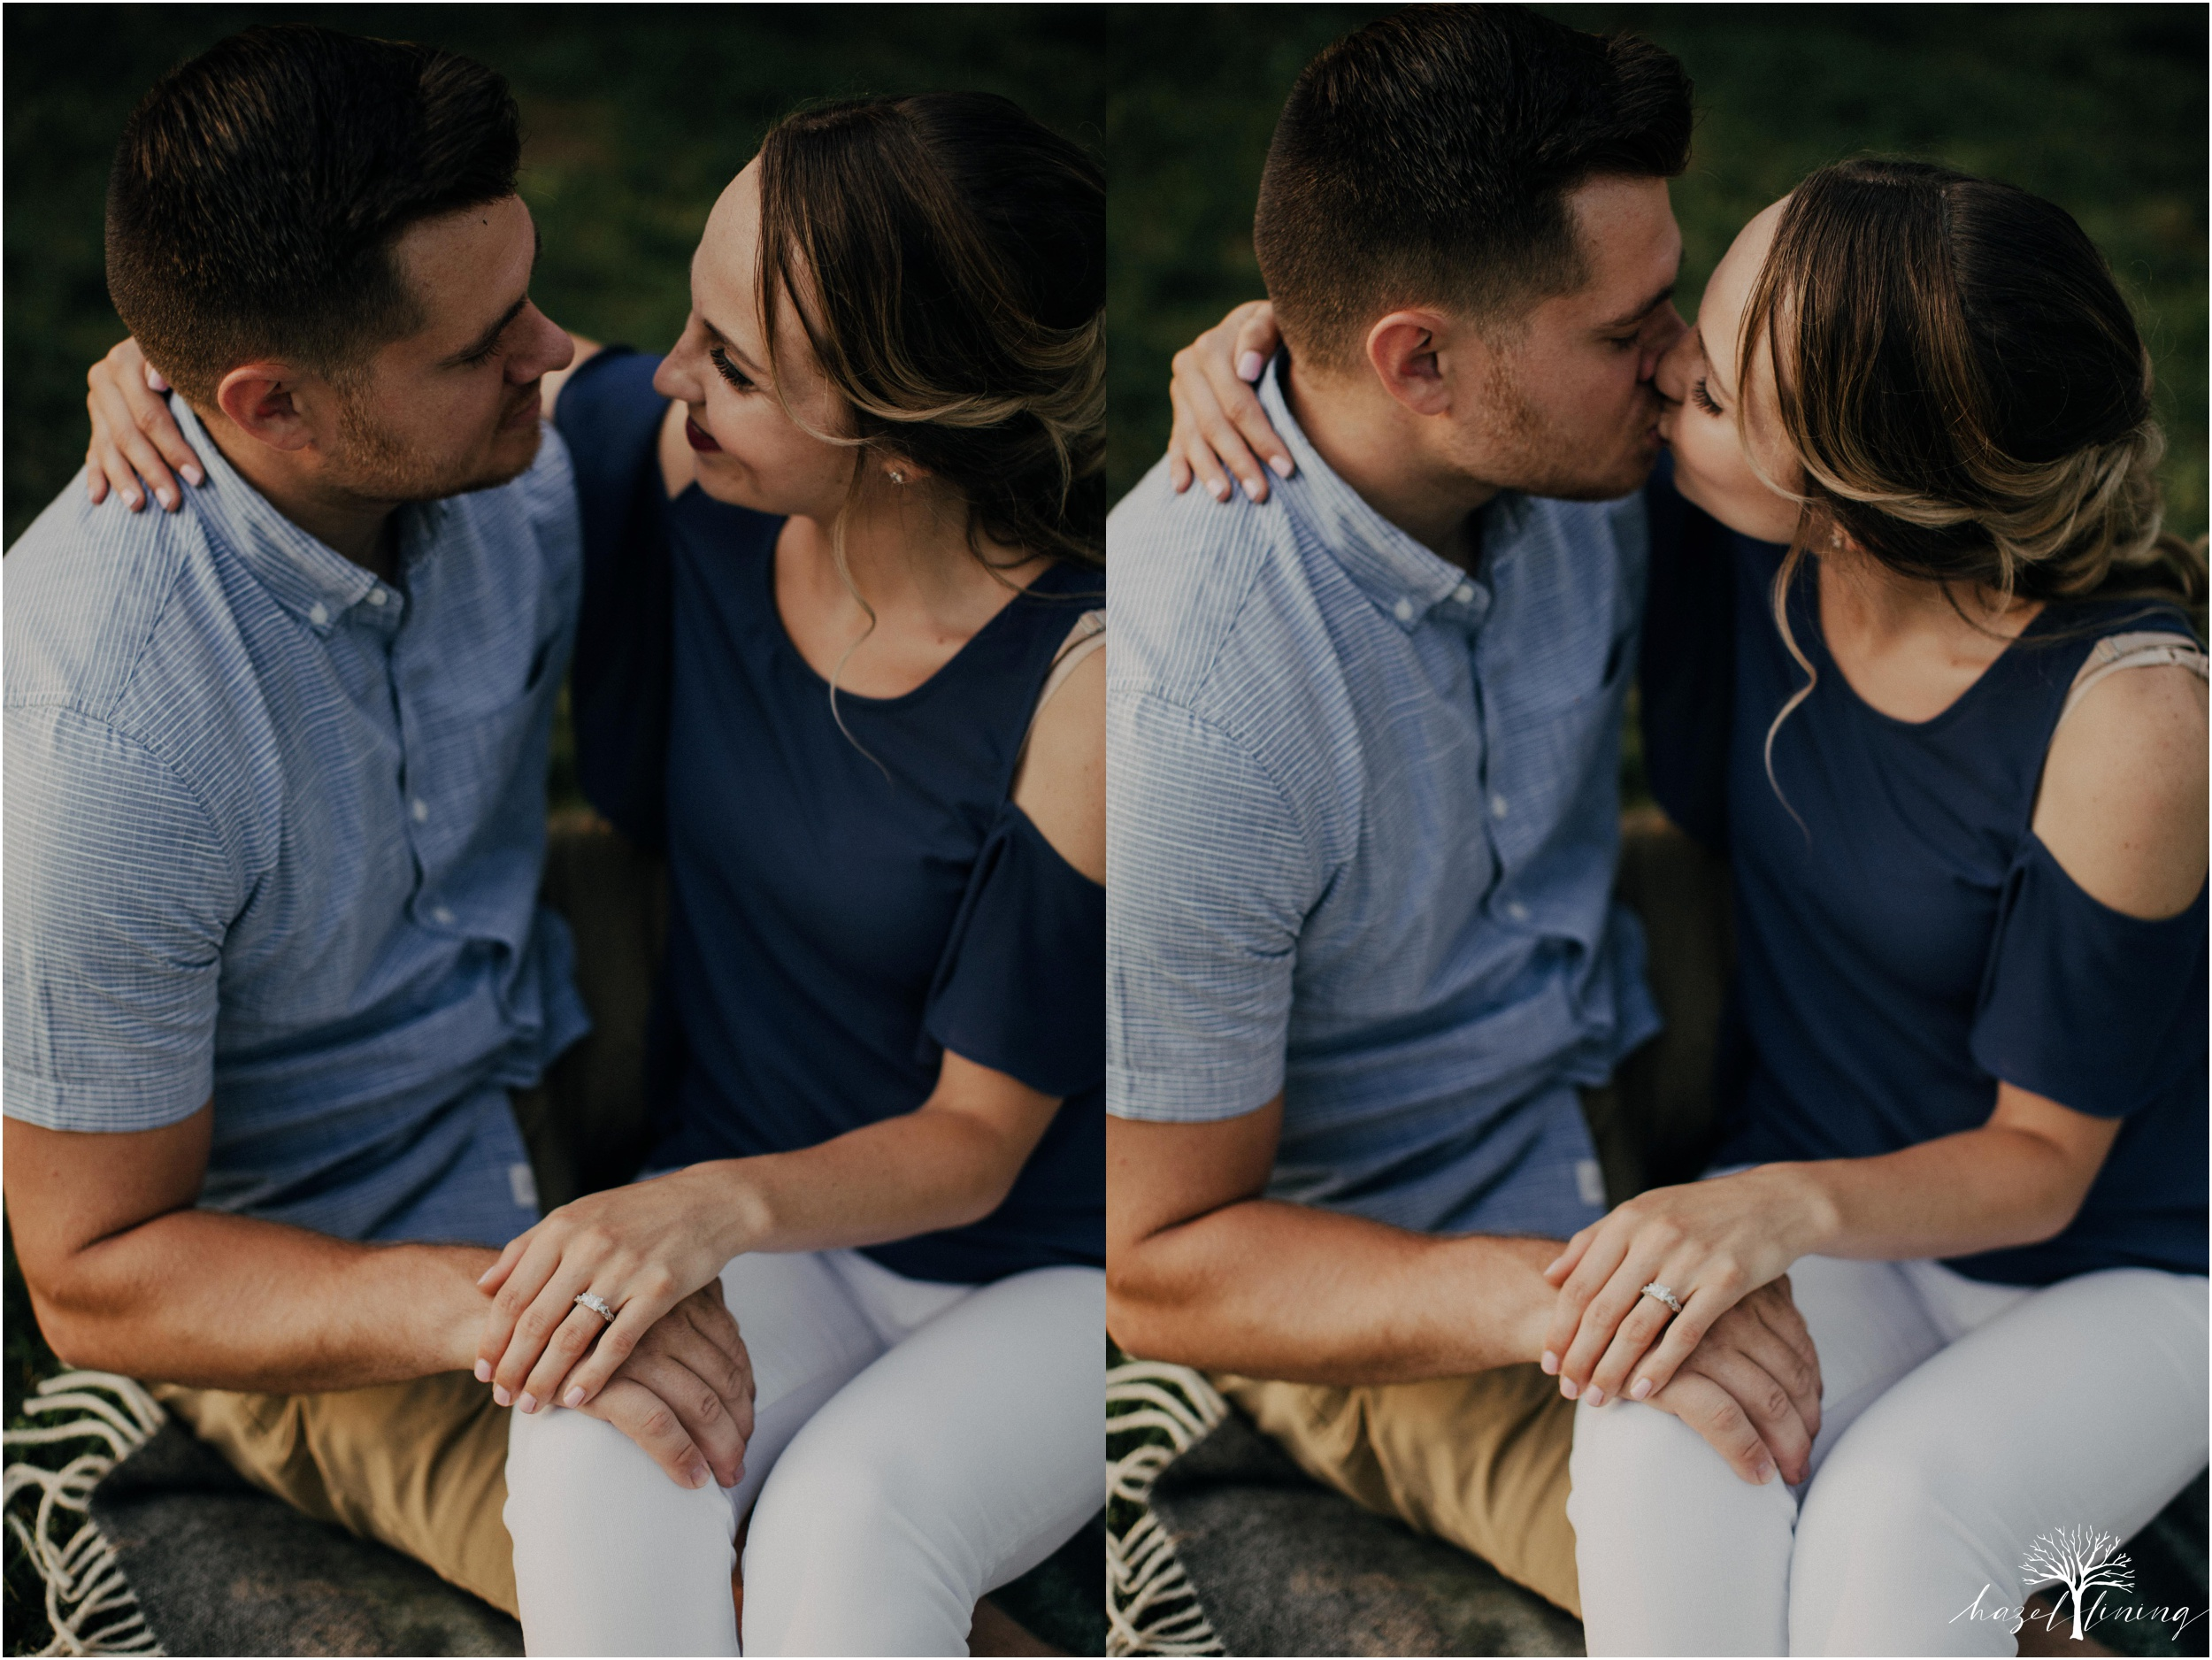 rachel-warner-chris-niedrist-the-farm-bakery-and-events-quakertown-pa-summer-engagement-hazel-lining-photography-destination-elopement-wedding-engagement-photography_0067.jpg